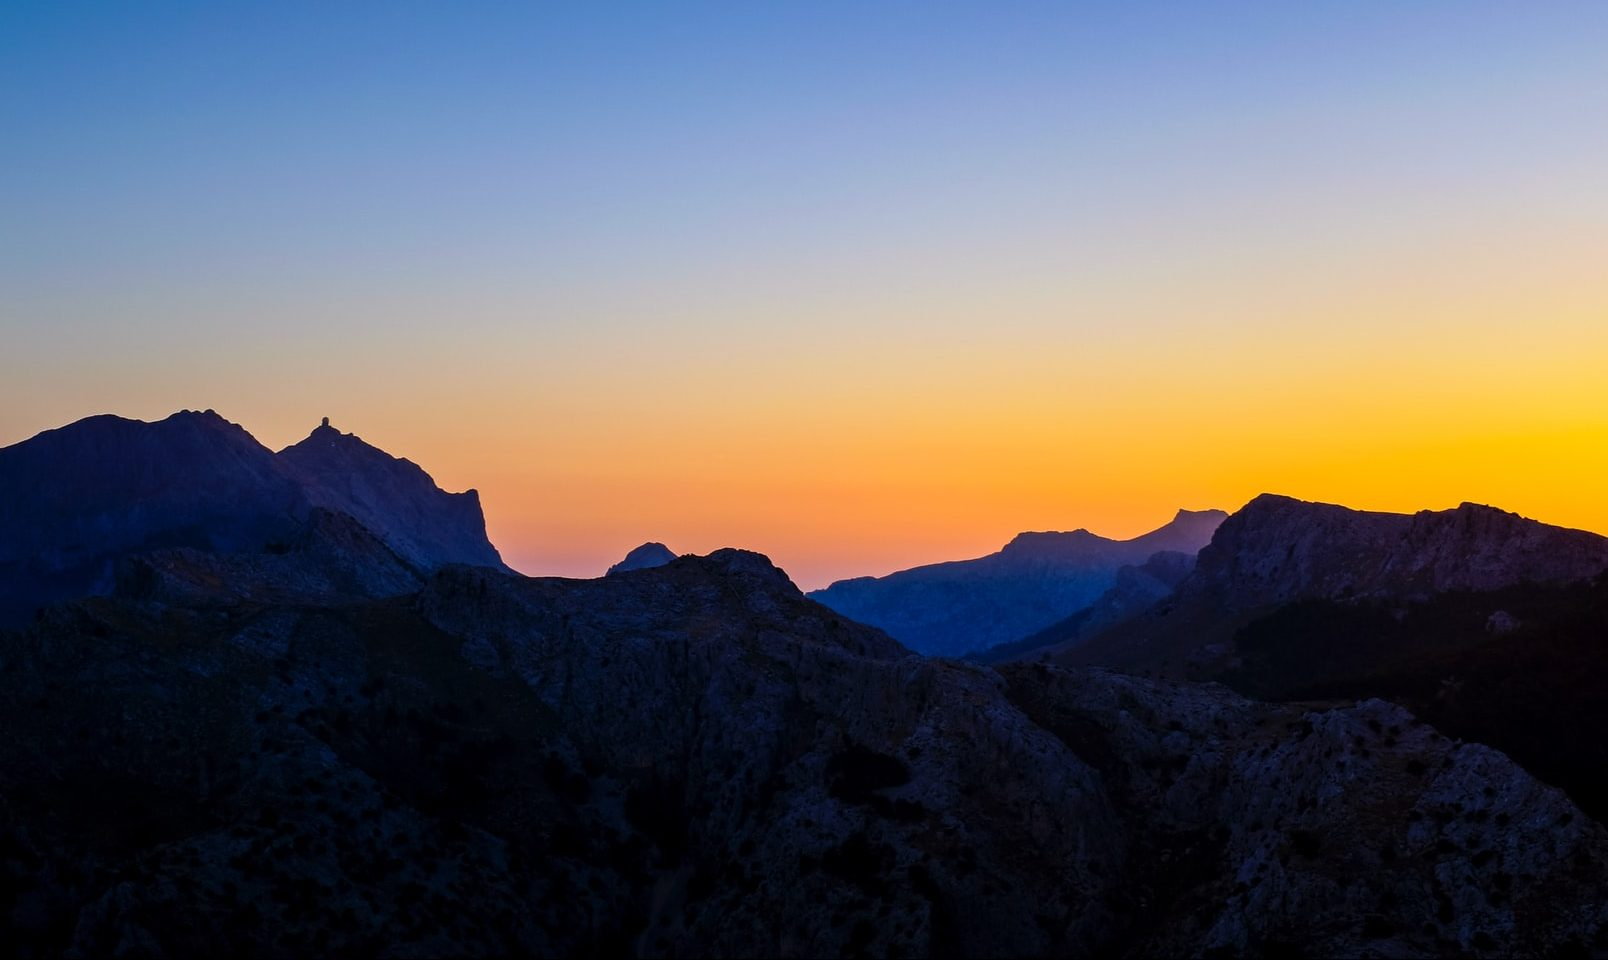 La Serra de Tramuntana, découvrez-la avec vos 5 sens